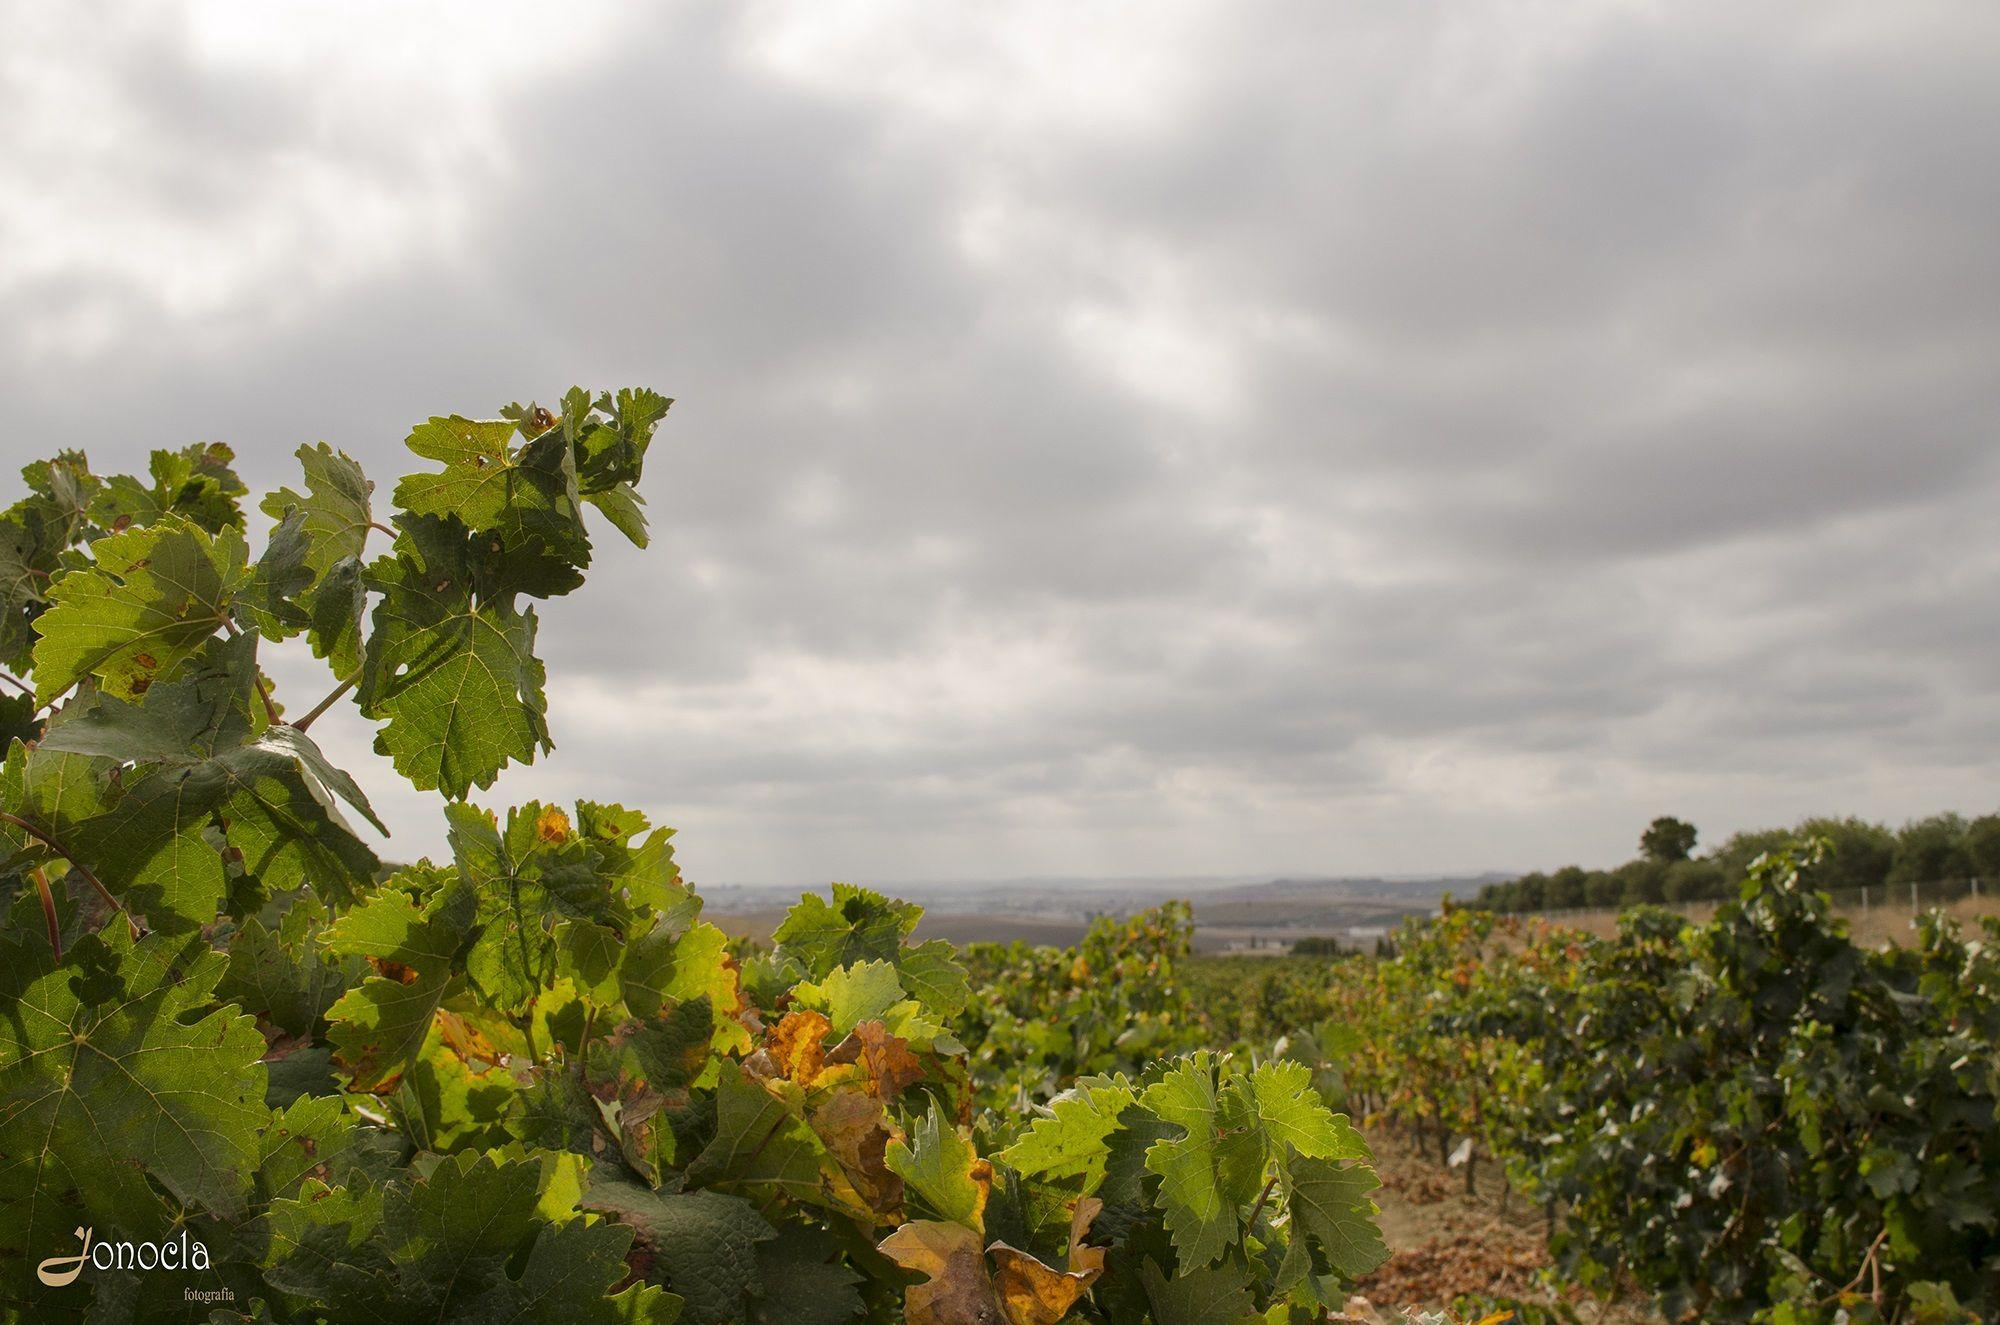 Jonocla uvas 5